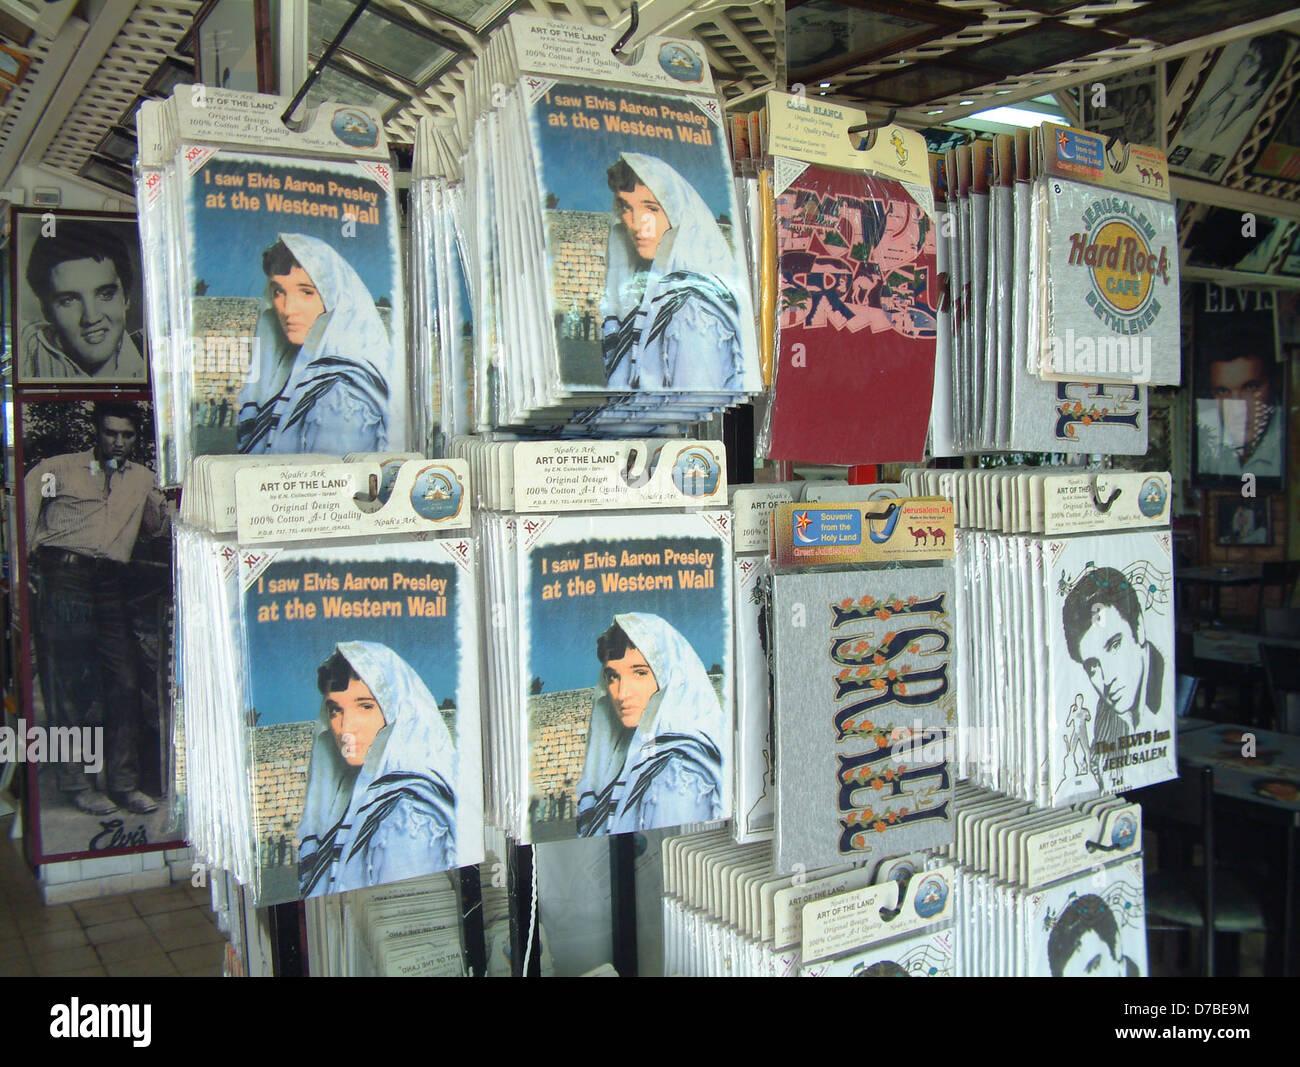 elvis presley image on jerusalem shirts - Stock Image